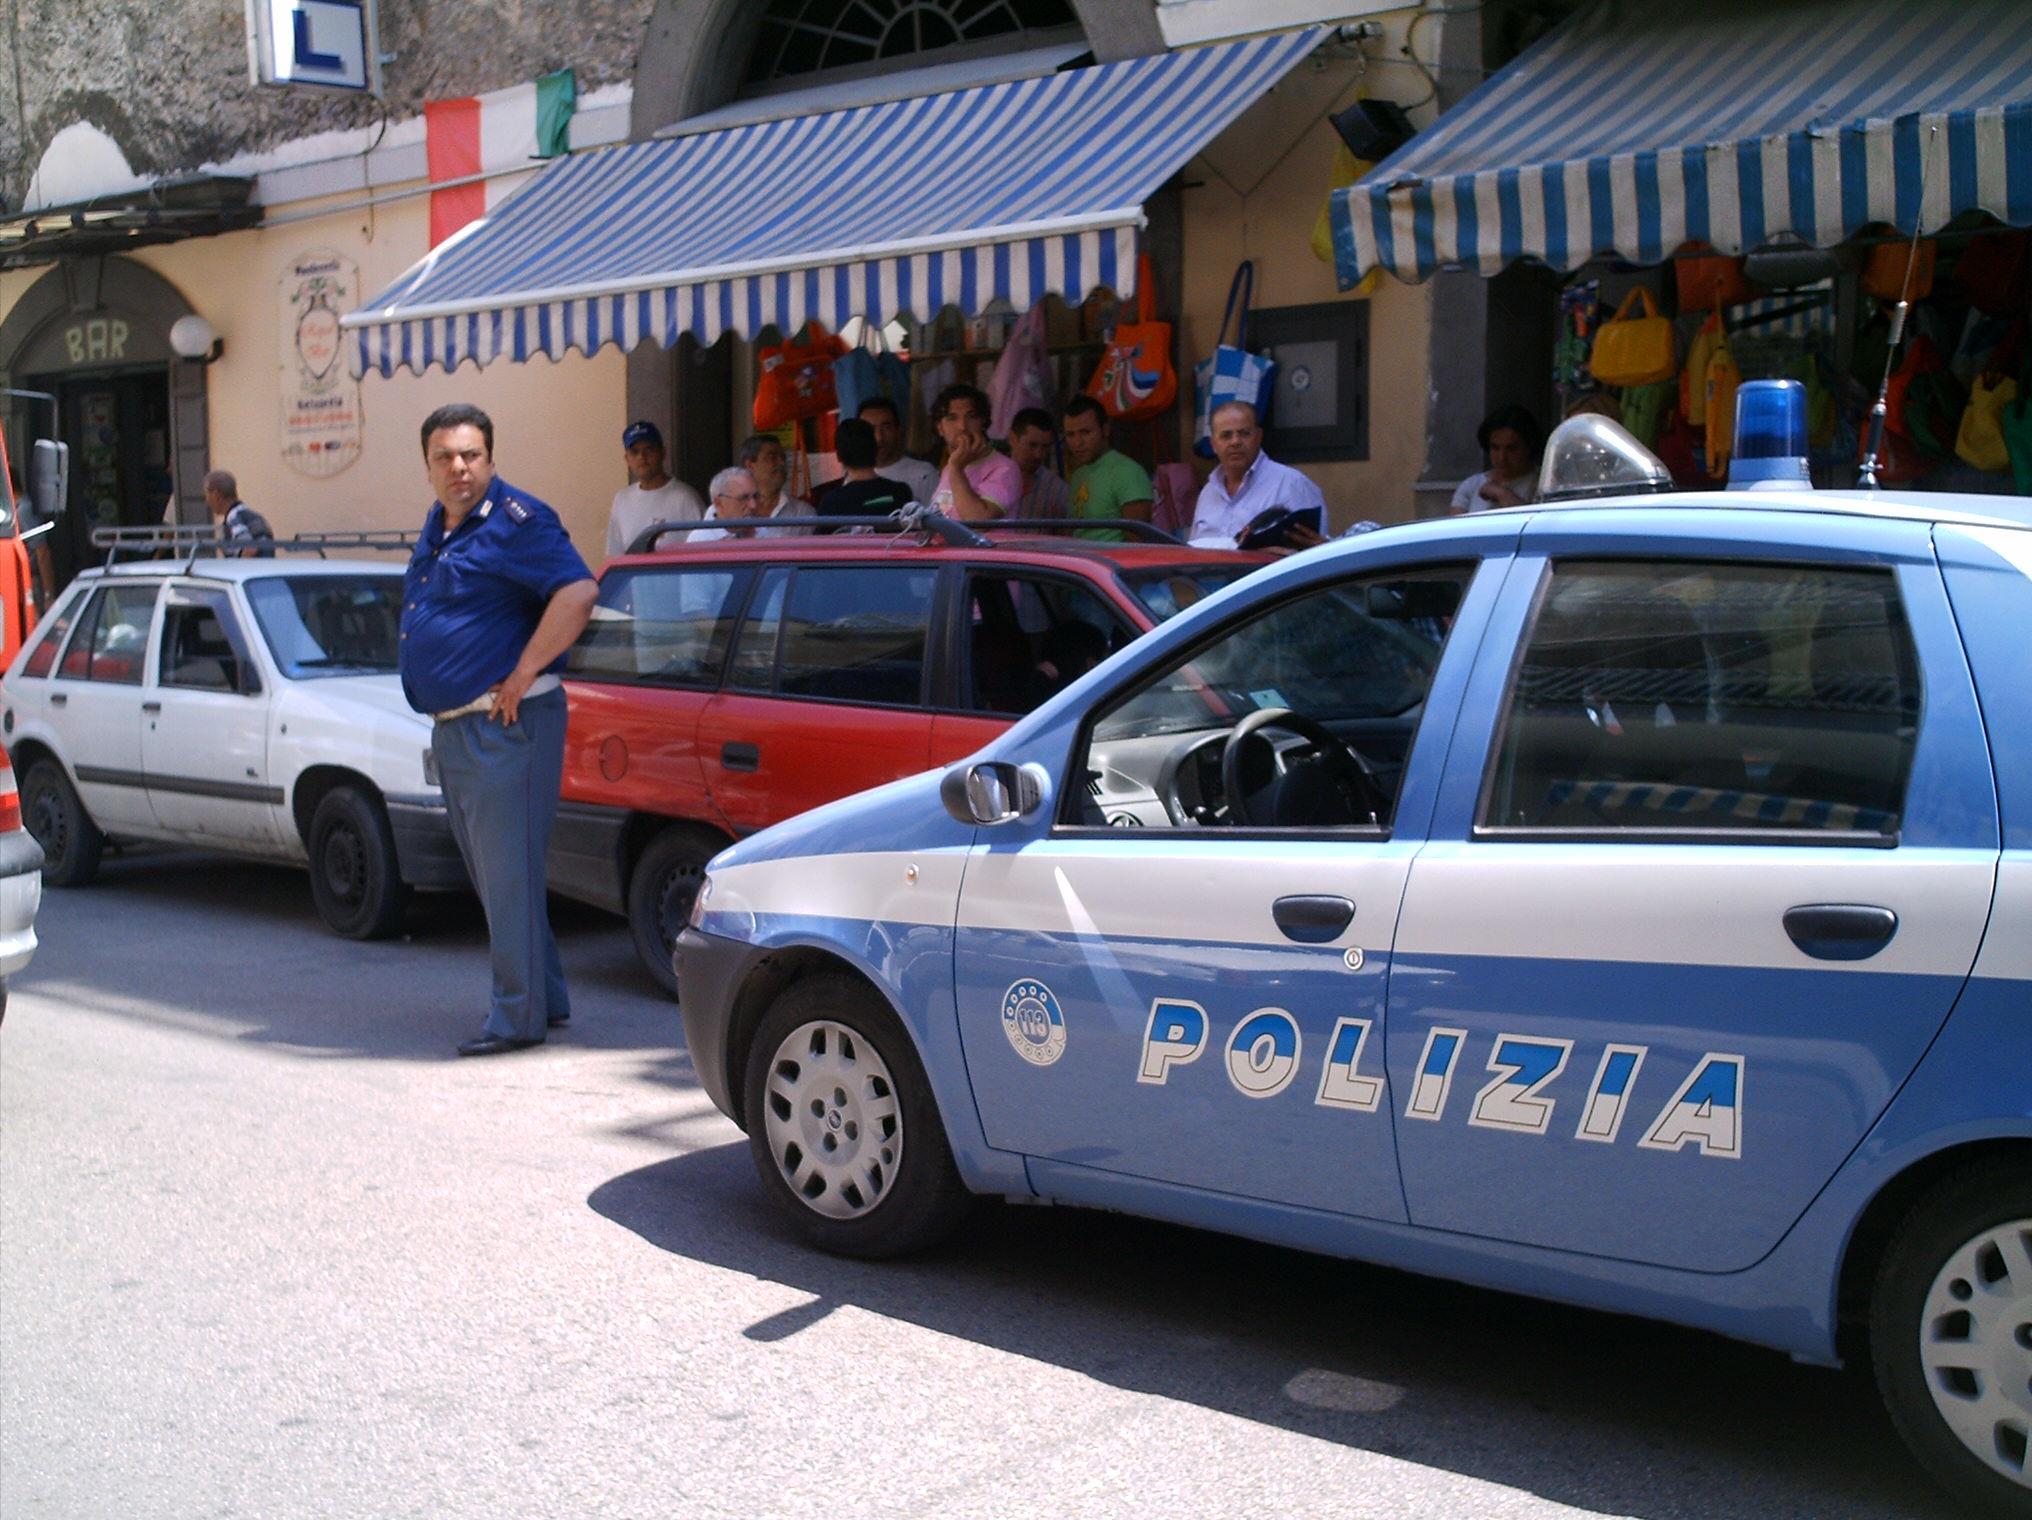 Ingrosso Tappeti San Giuseppe Vesuviano commissariato di polizia san giuseppe vesuviano | blog di